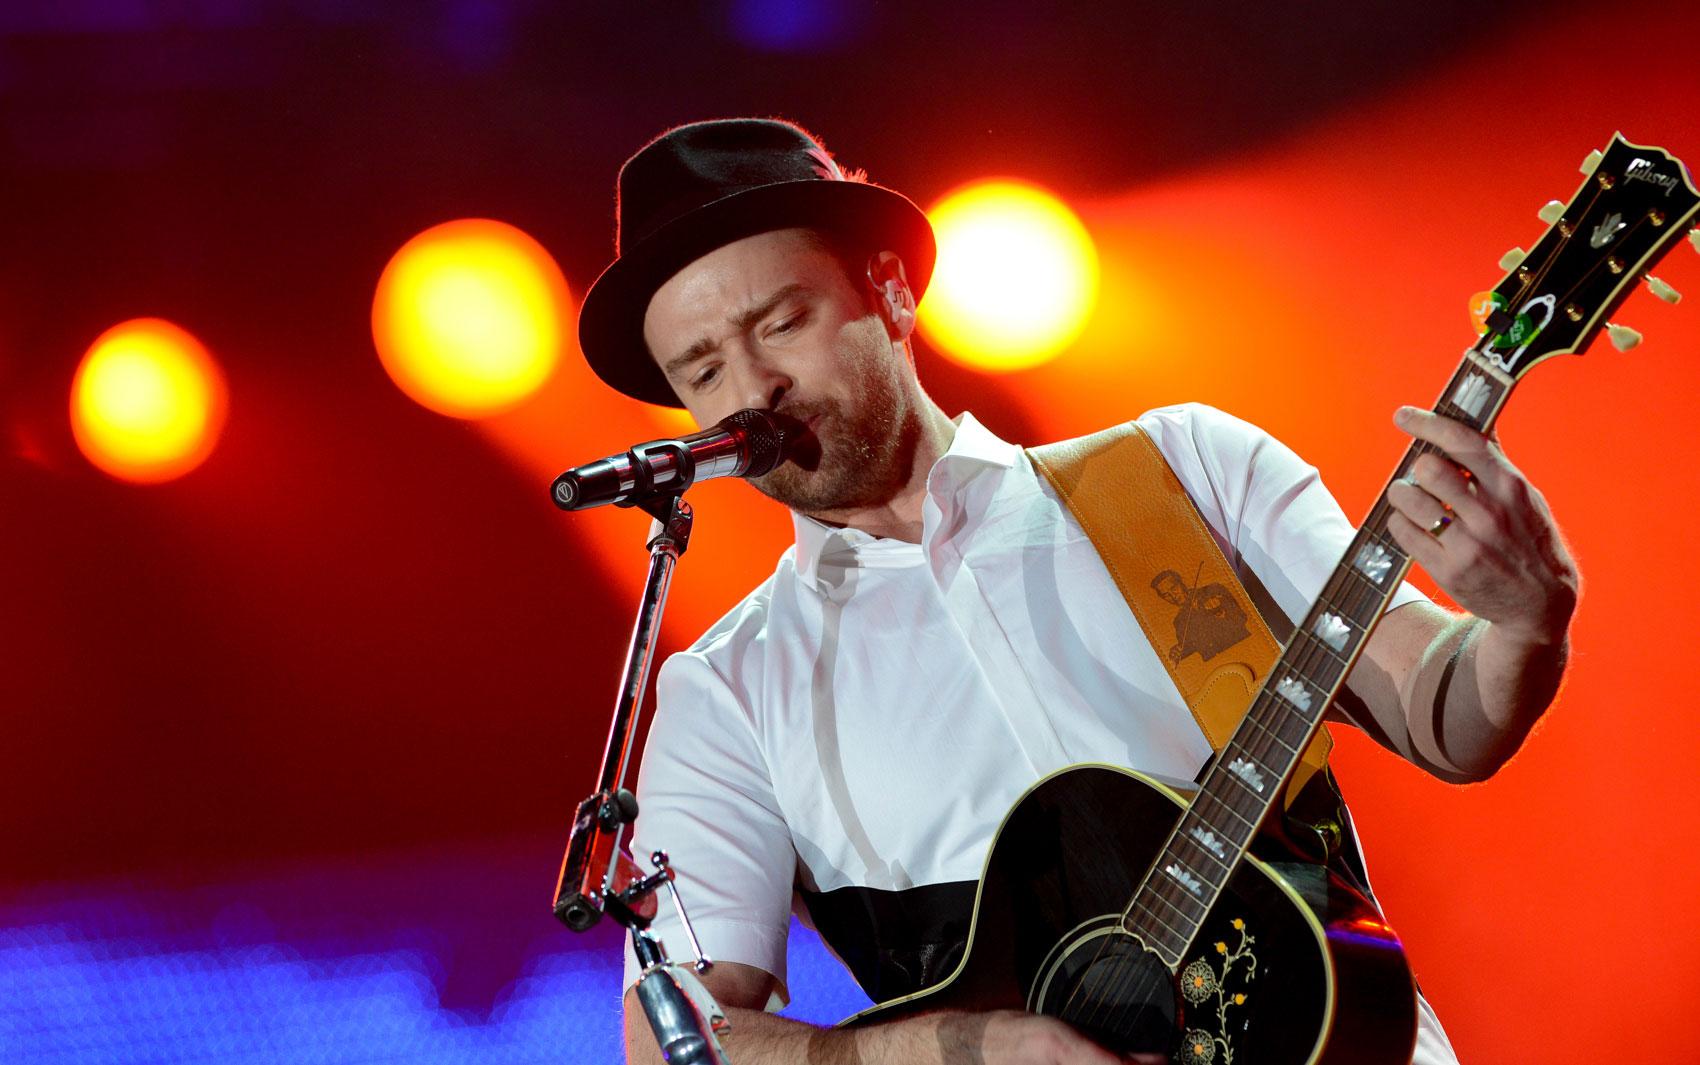 Justin Timberlake durante show no Palco Mundo neste domingo (15)